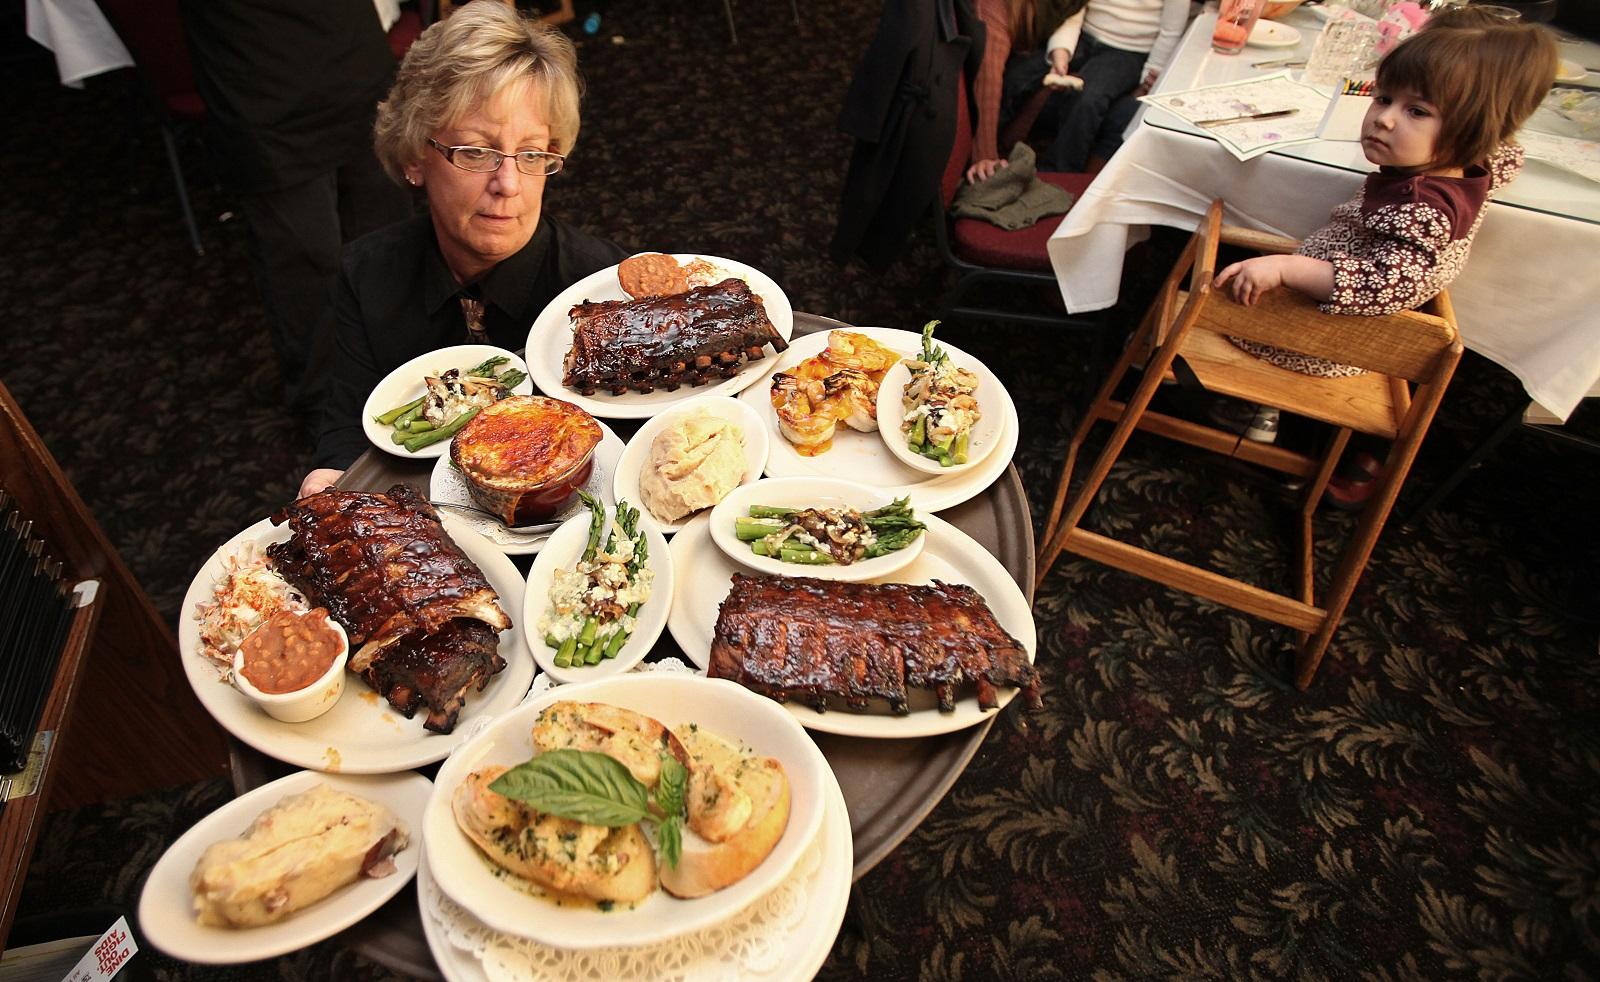 Server Shirley Franz handles a massive platter of food at Hideaway Grille in North Tonawanda. (Buffalo News file photo)